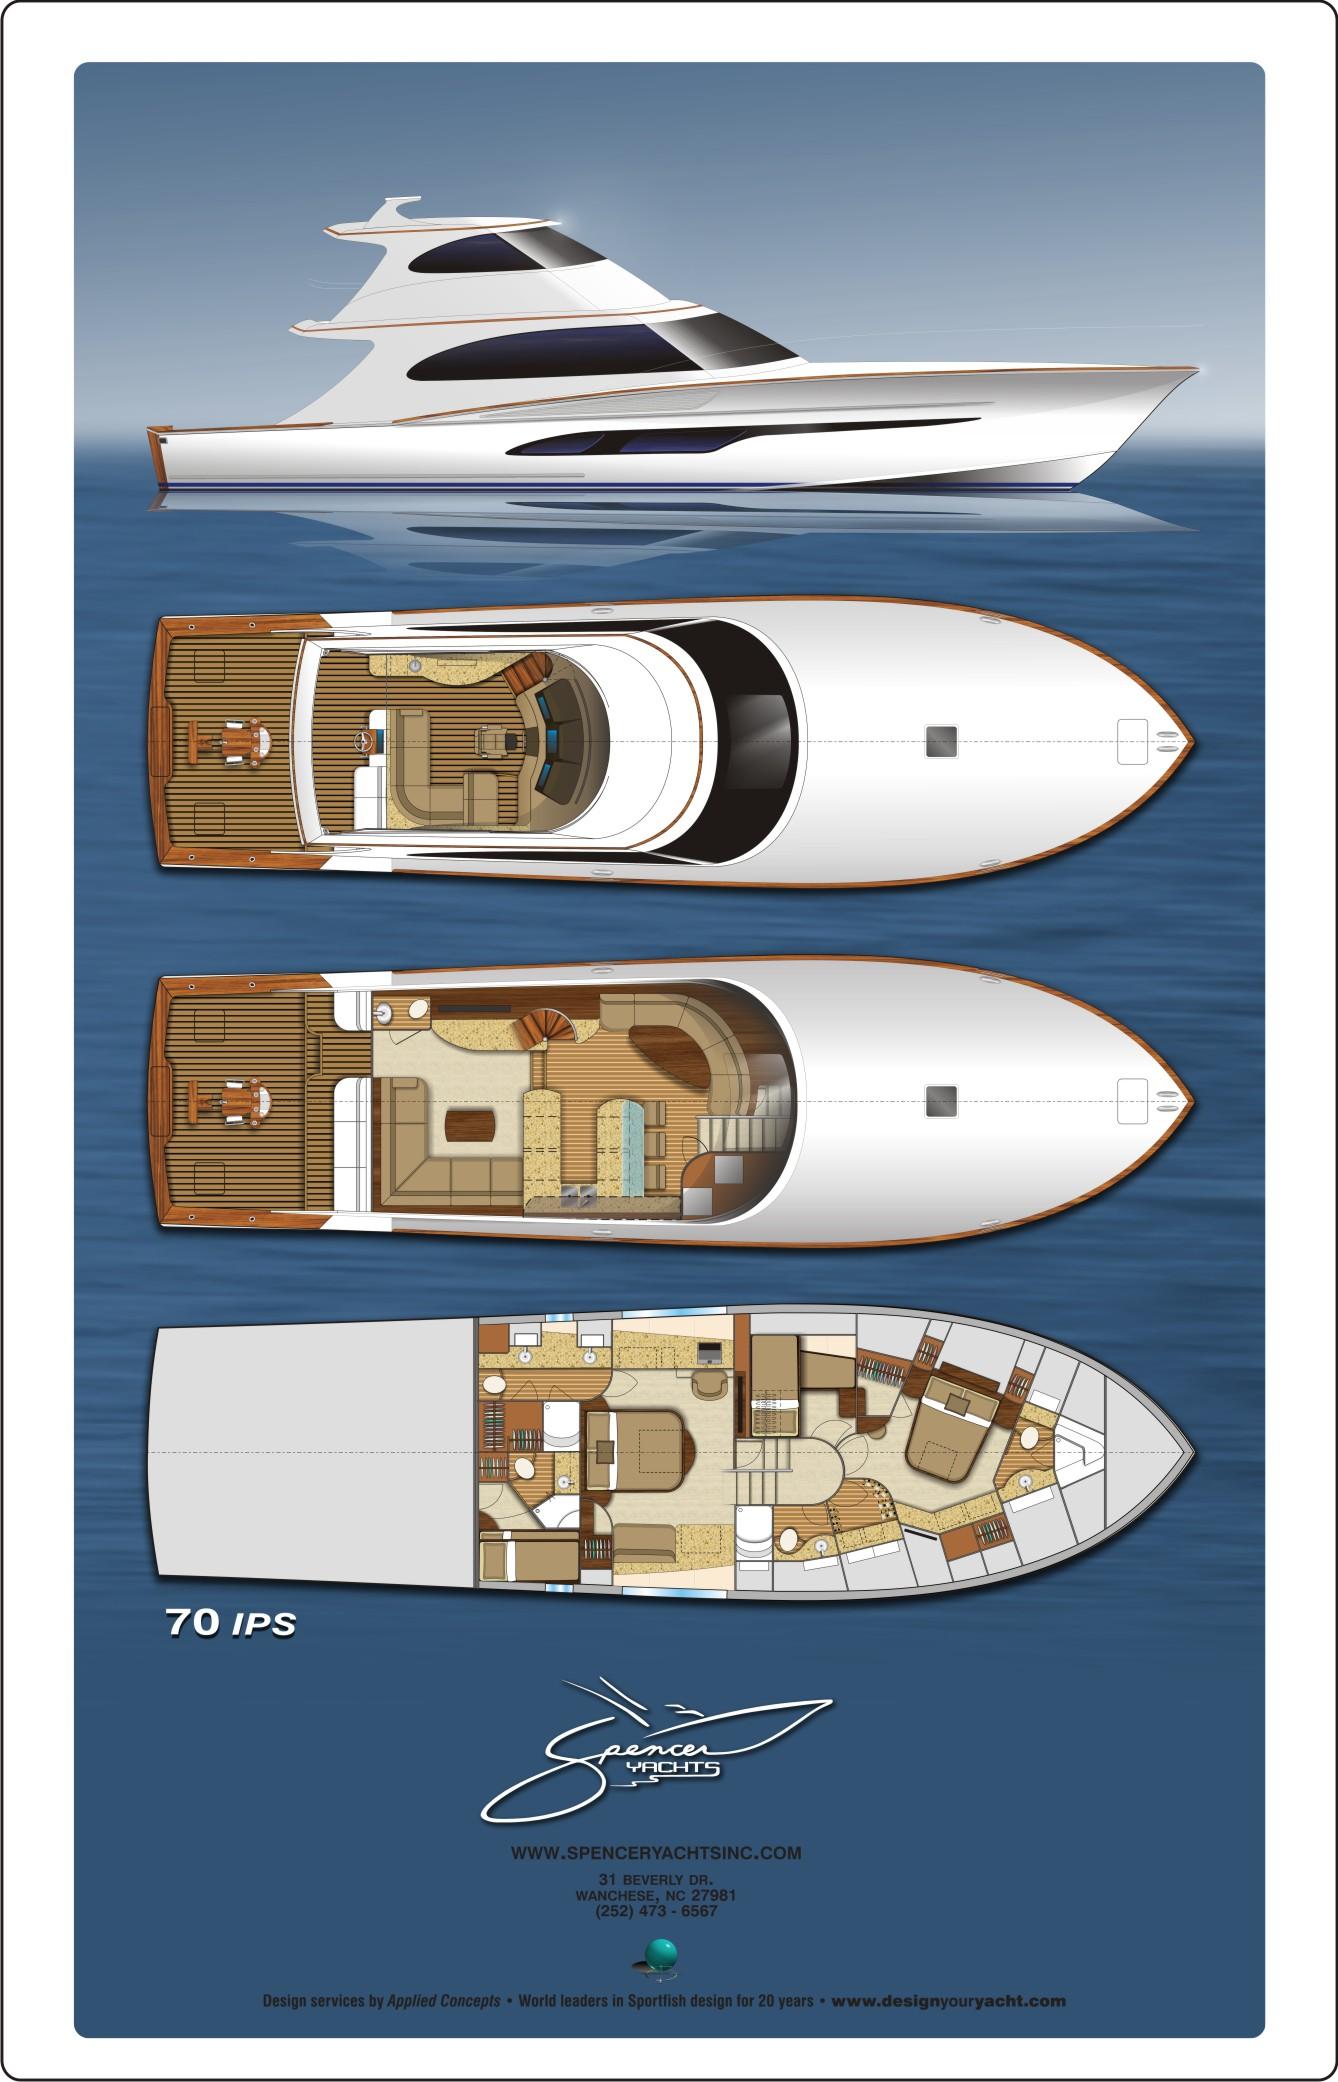 Spencer Sportfish Applied Concepts Unleashed Yacht Design